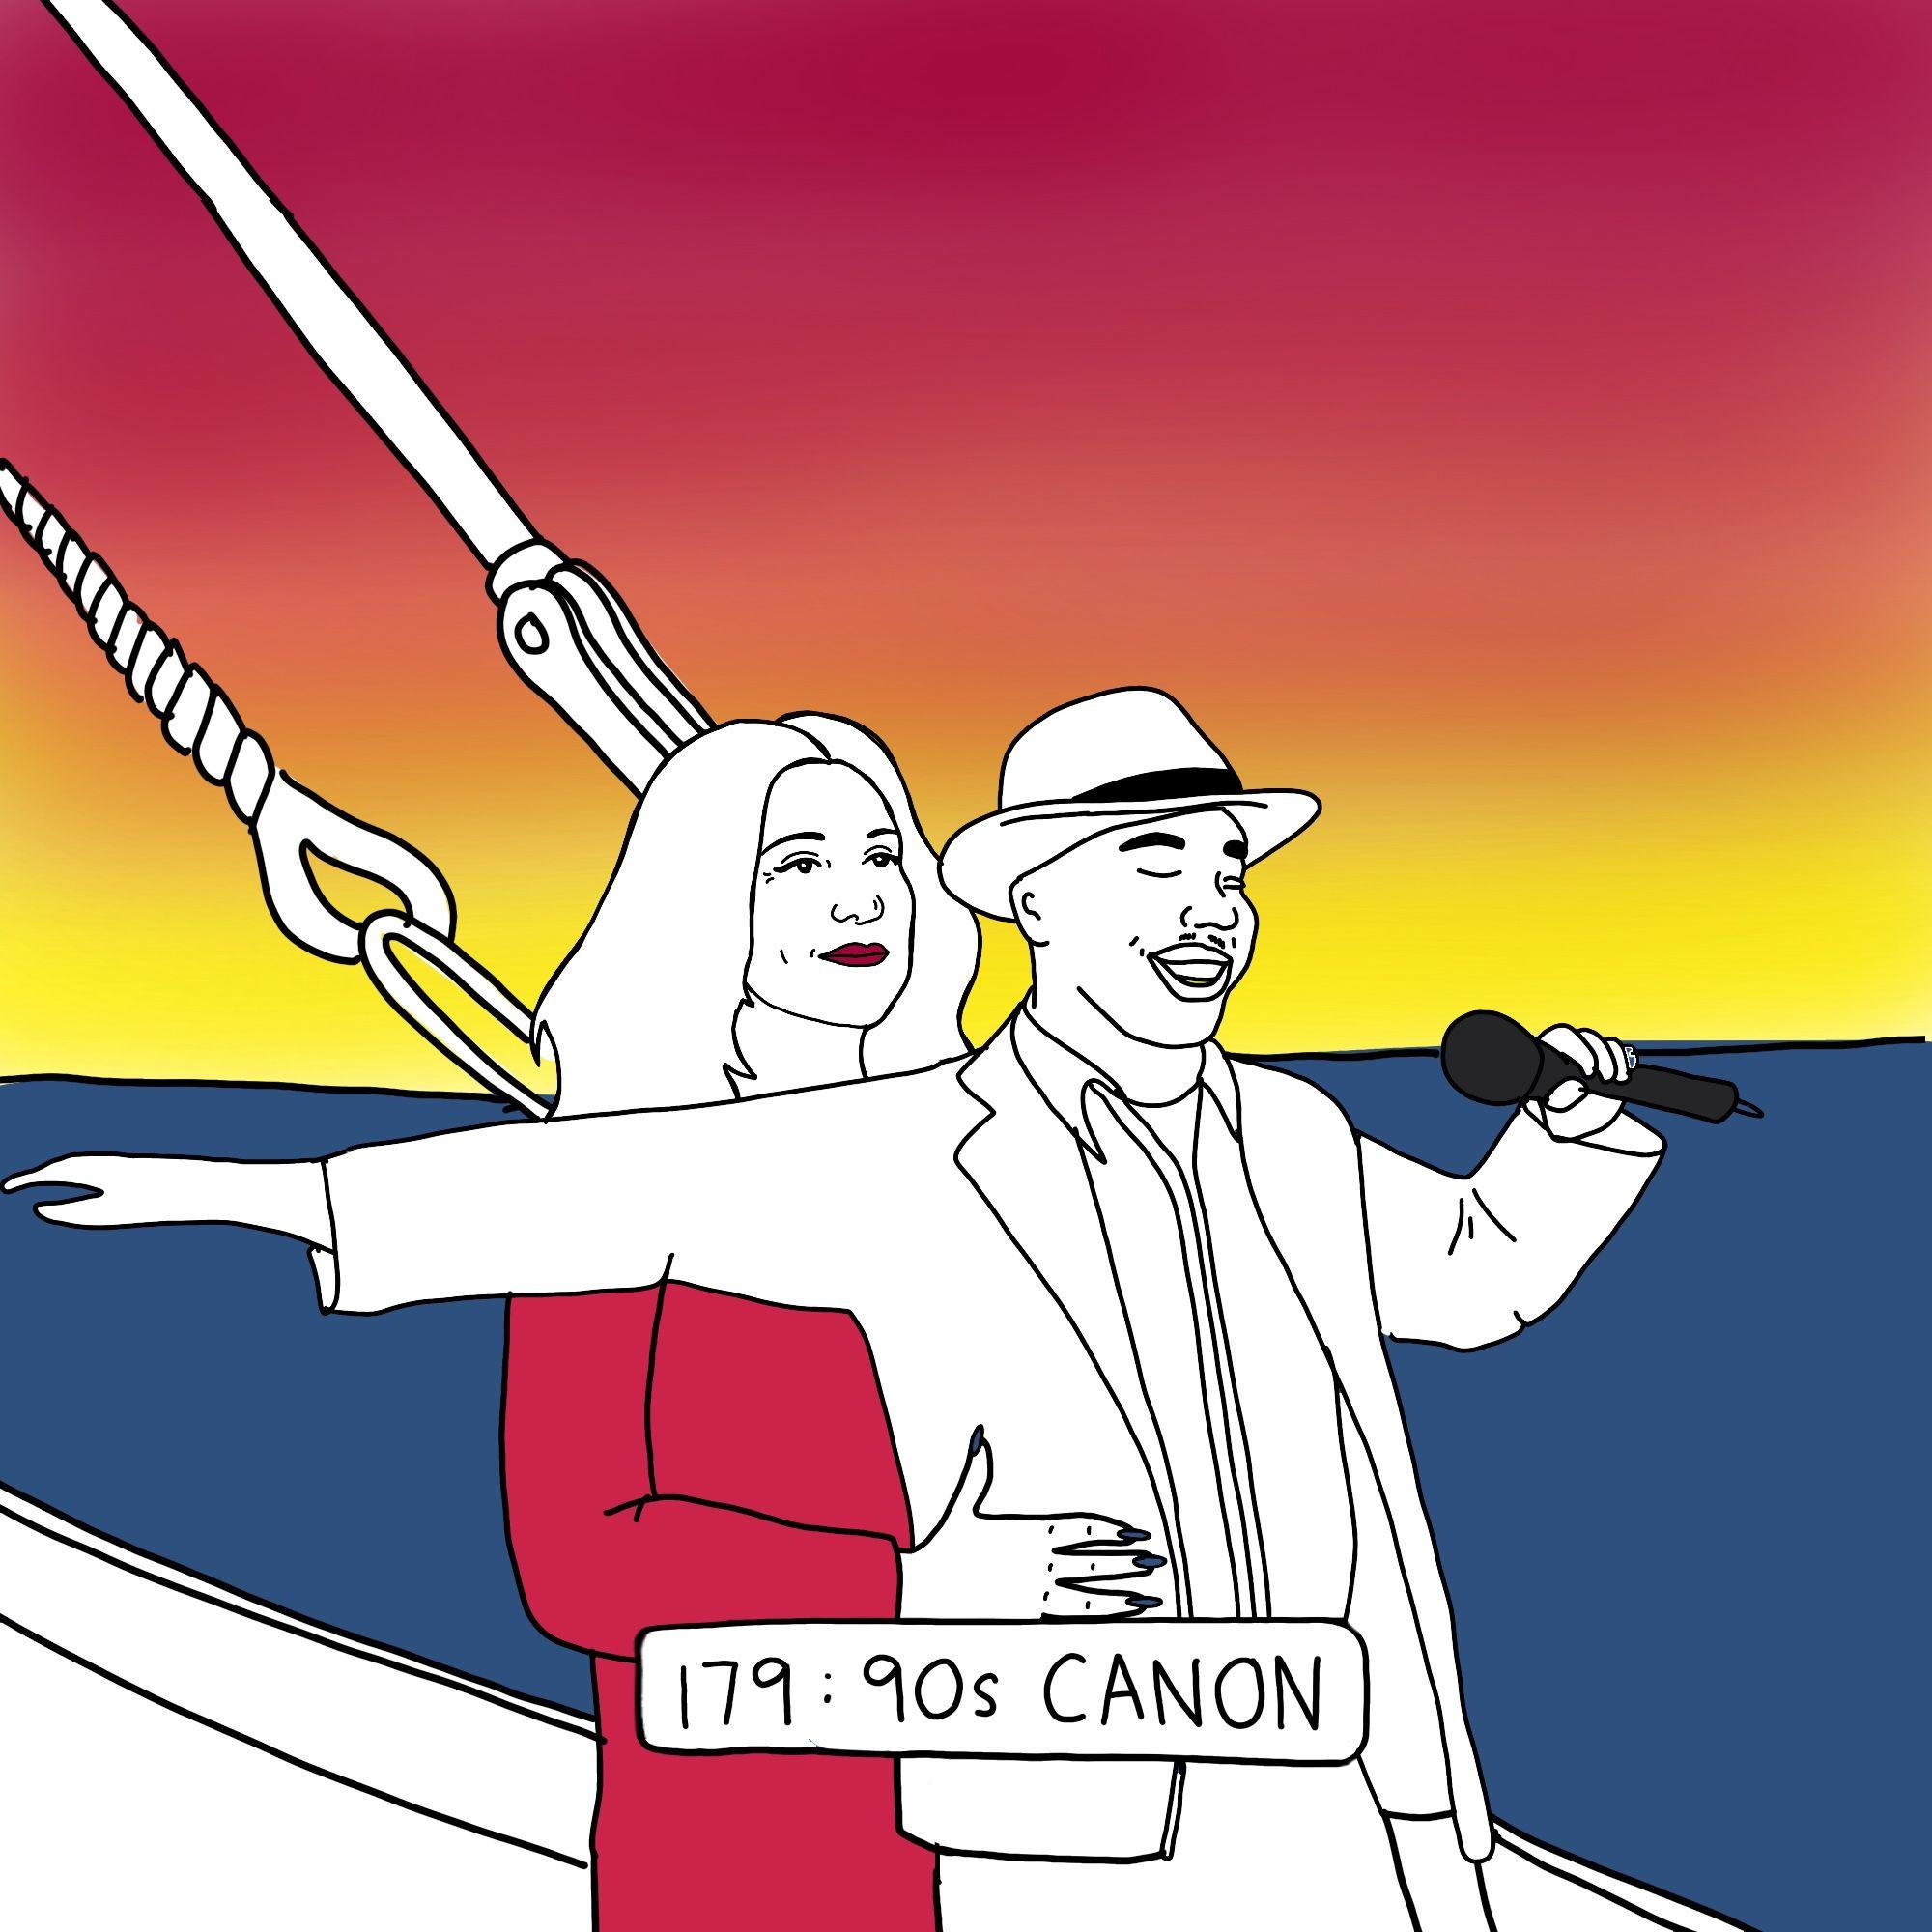 90s Music Canon